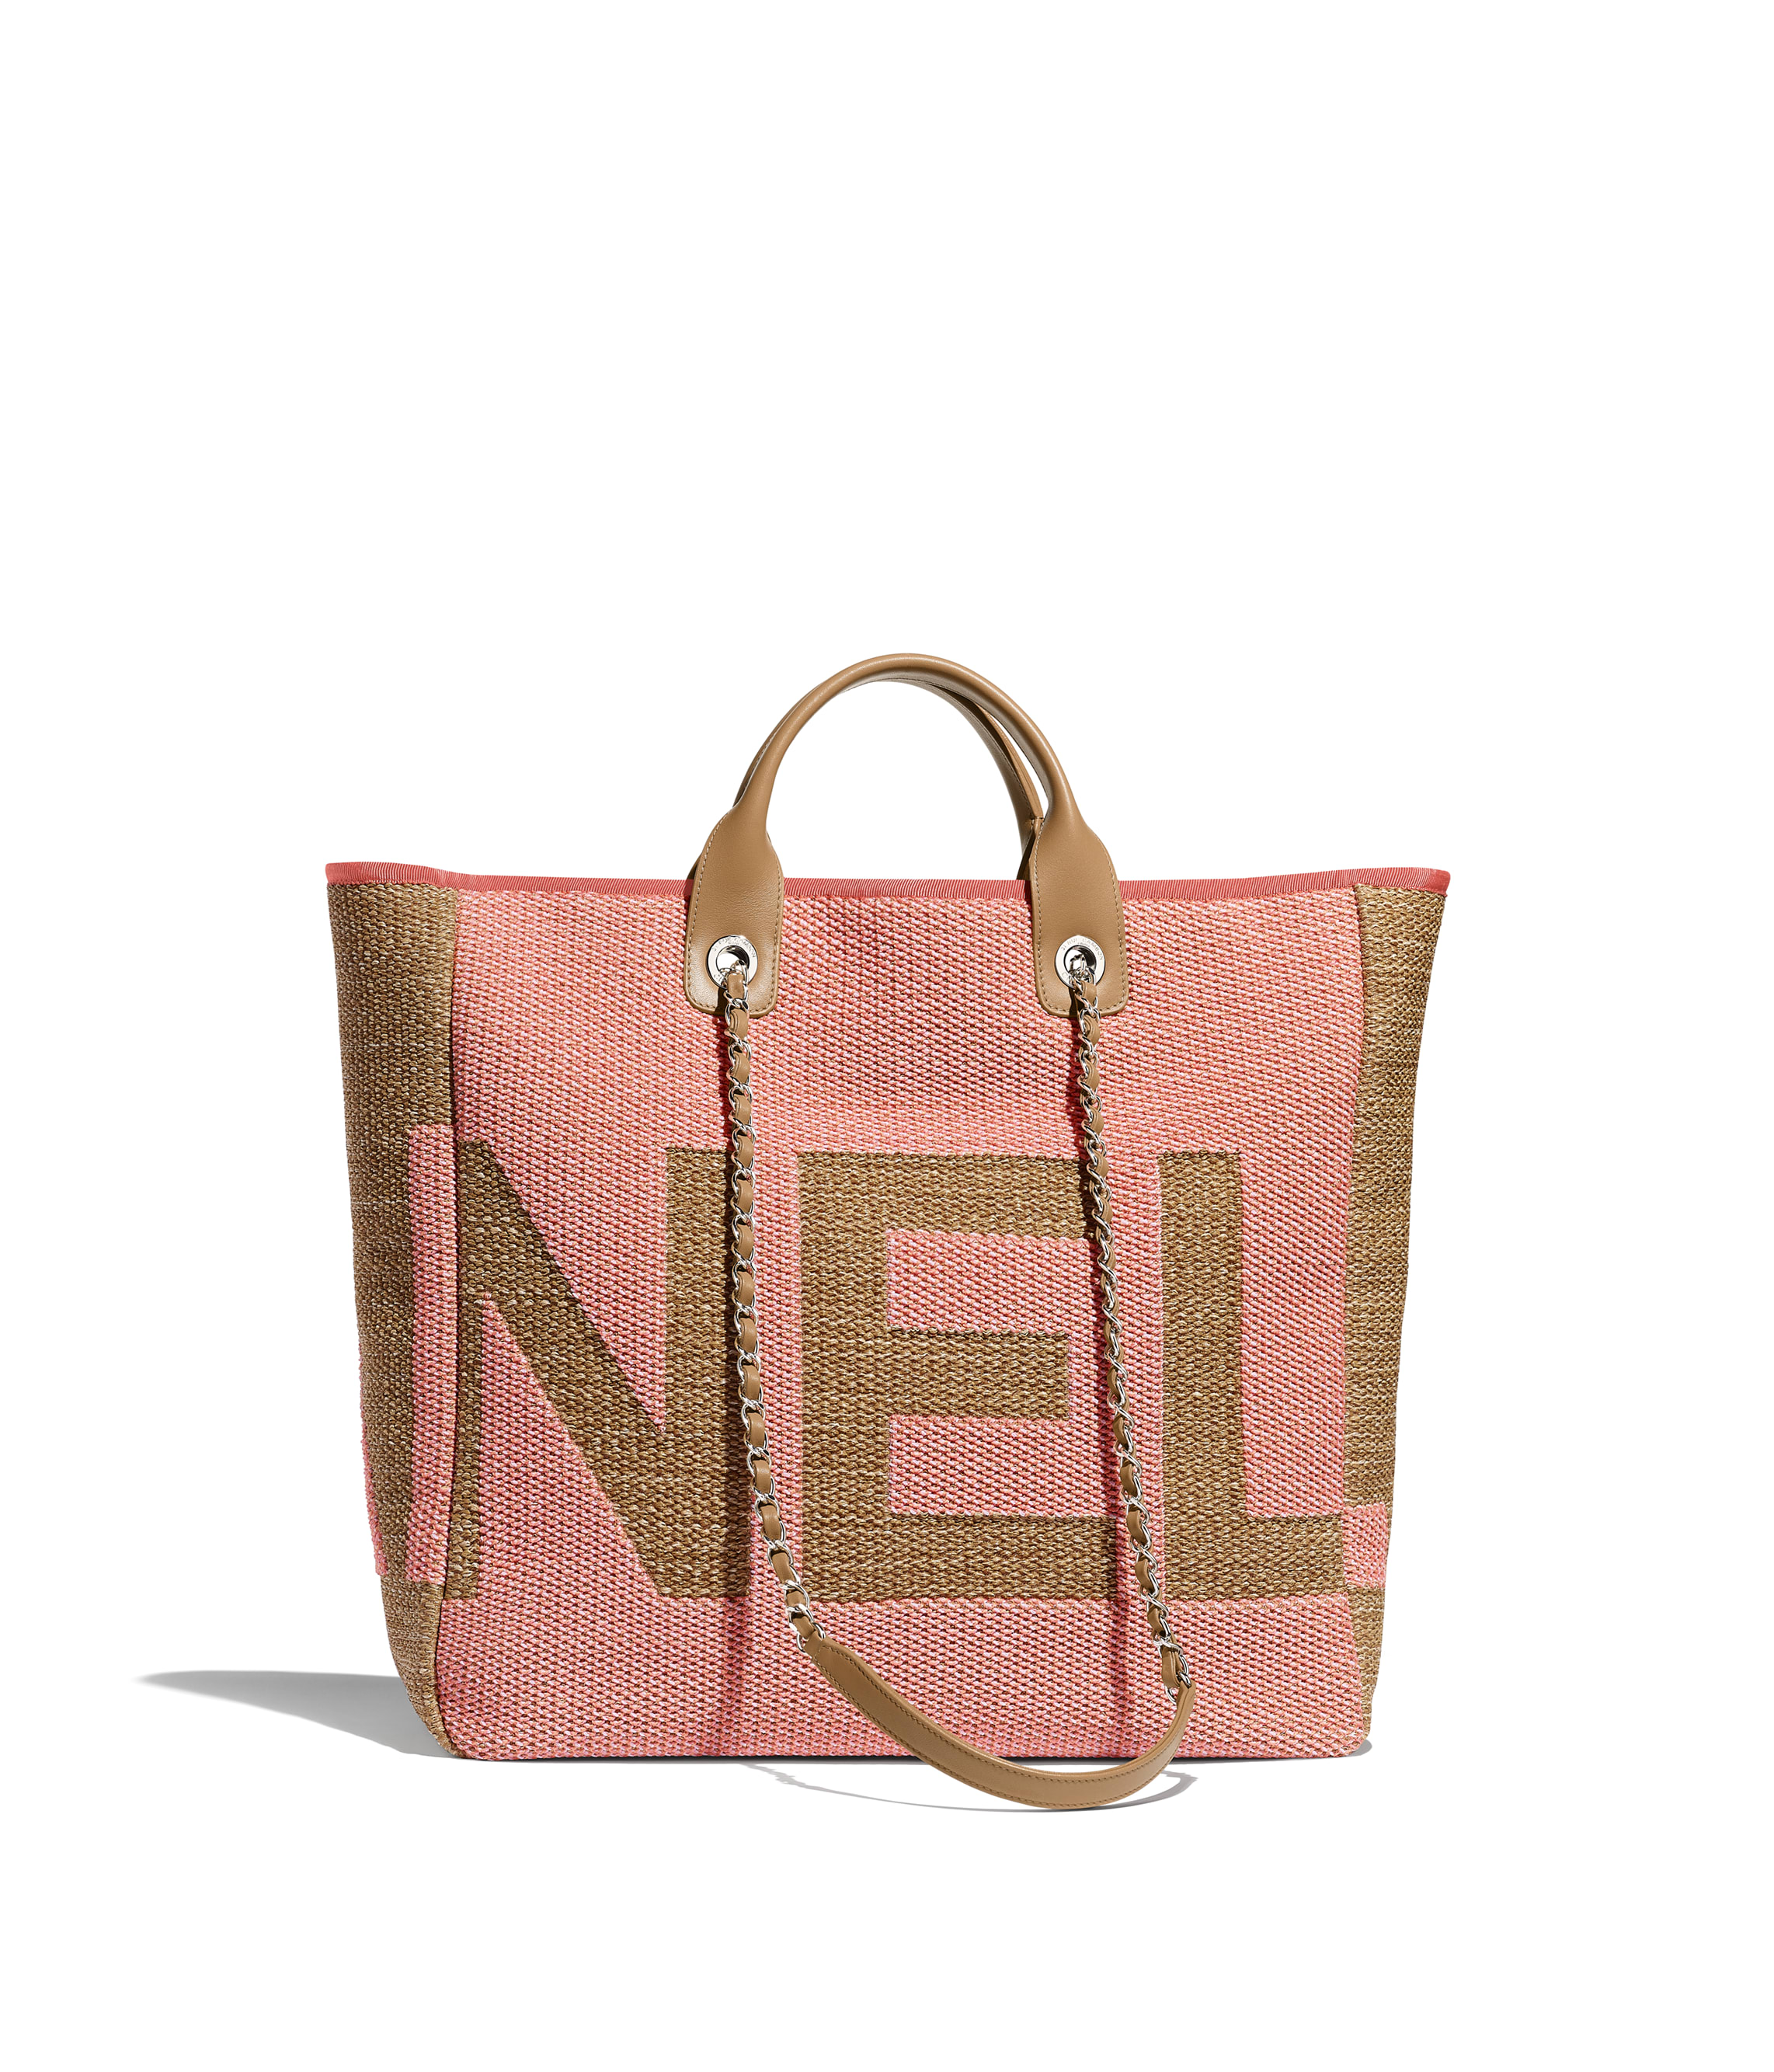 0cccff112593 Tote Bags - Handbags - CHANEL